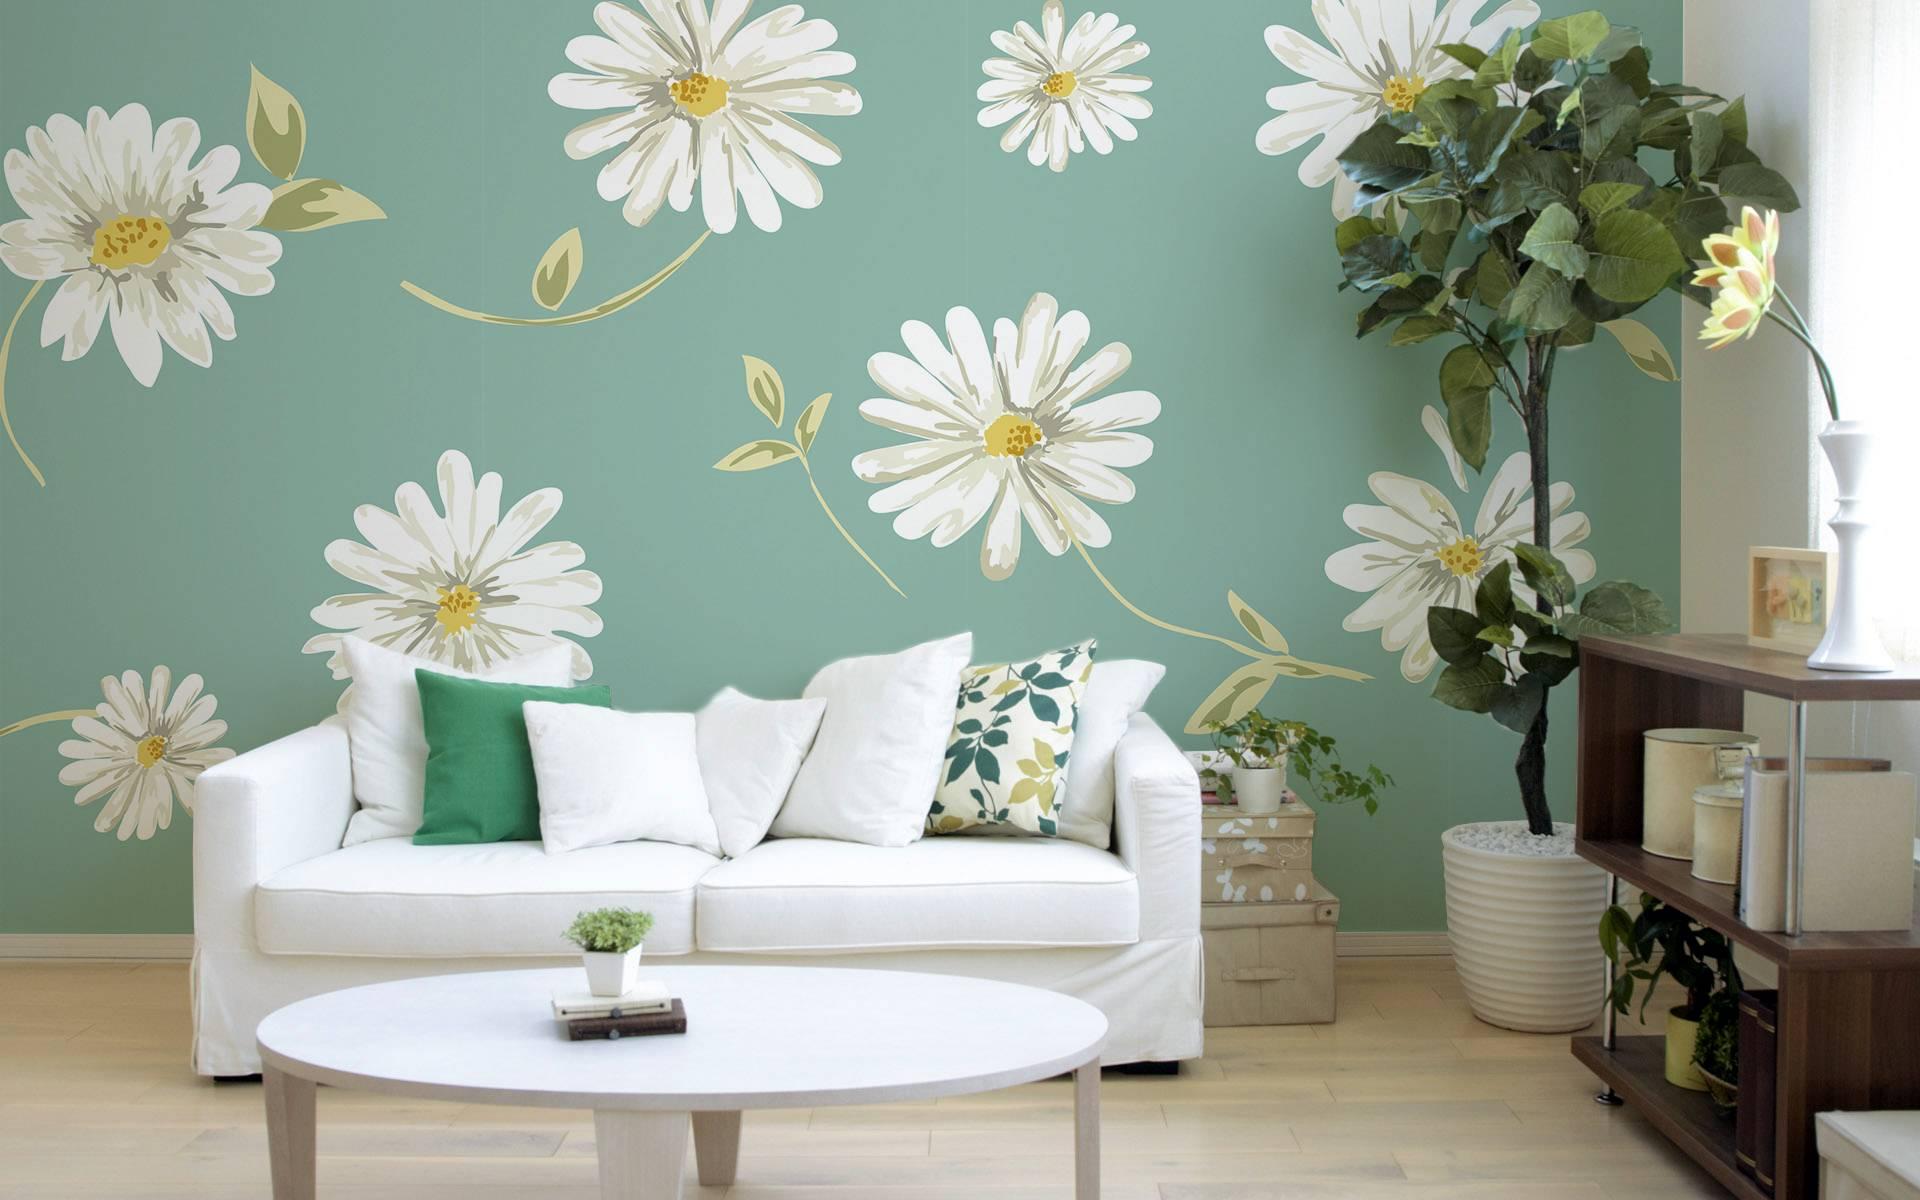 Subtle Daisies • Retro - Living room - Wall Murals - Nature ...